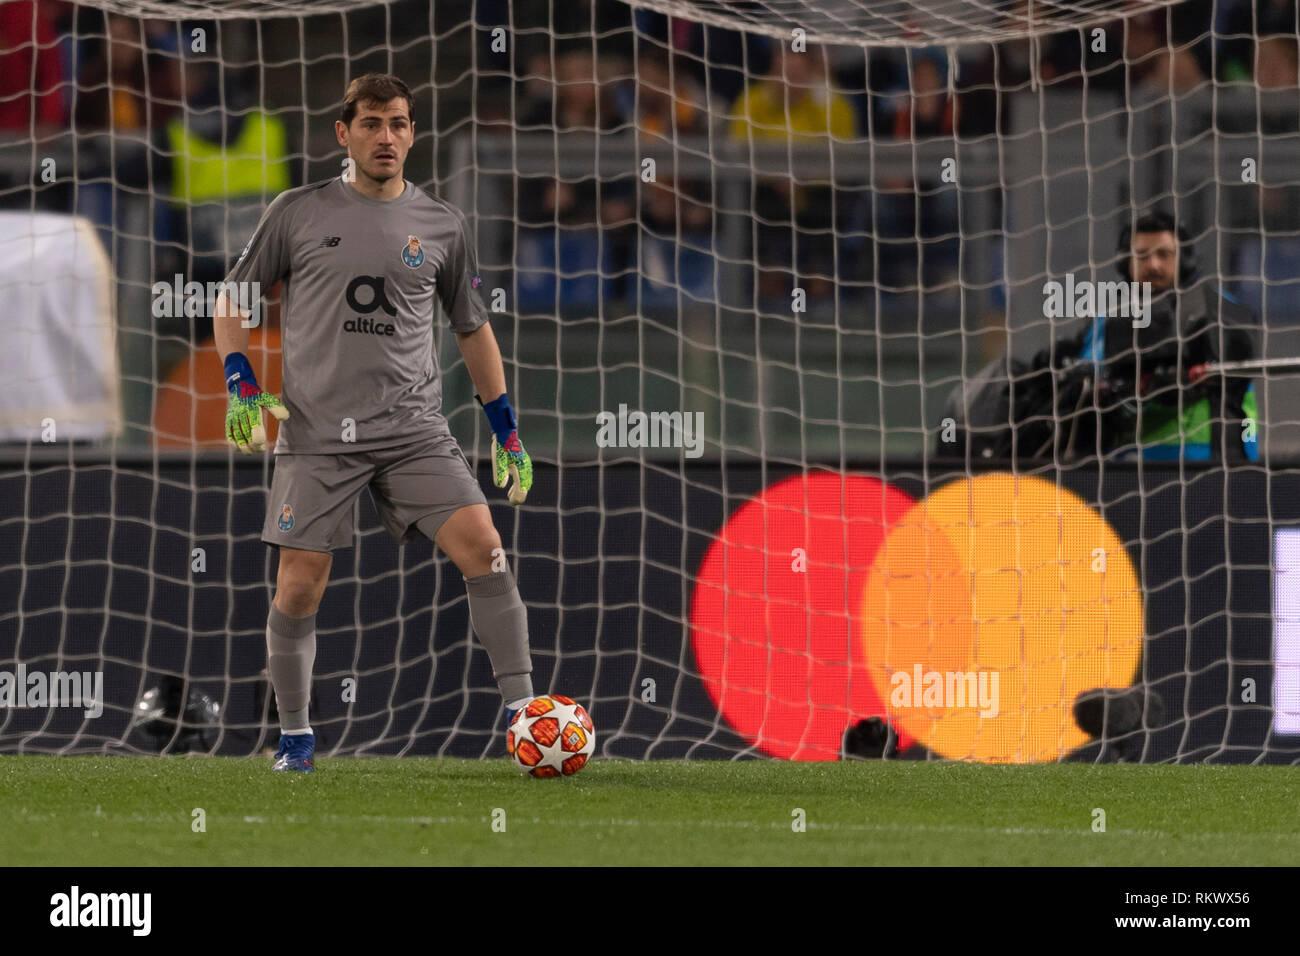 e994b02b32b Iker Casillas Fernandez (Porto) during the